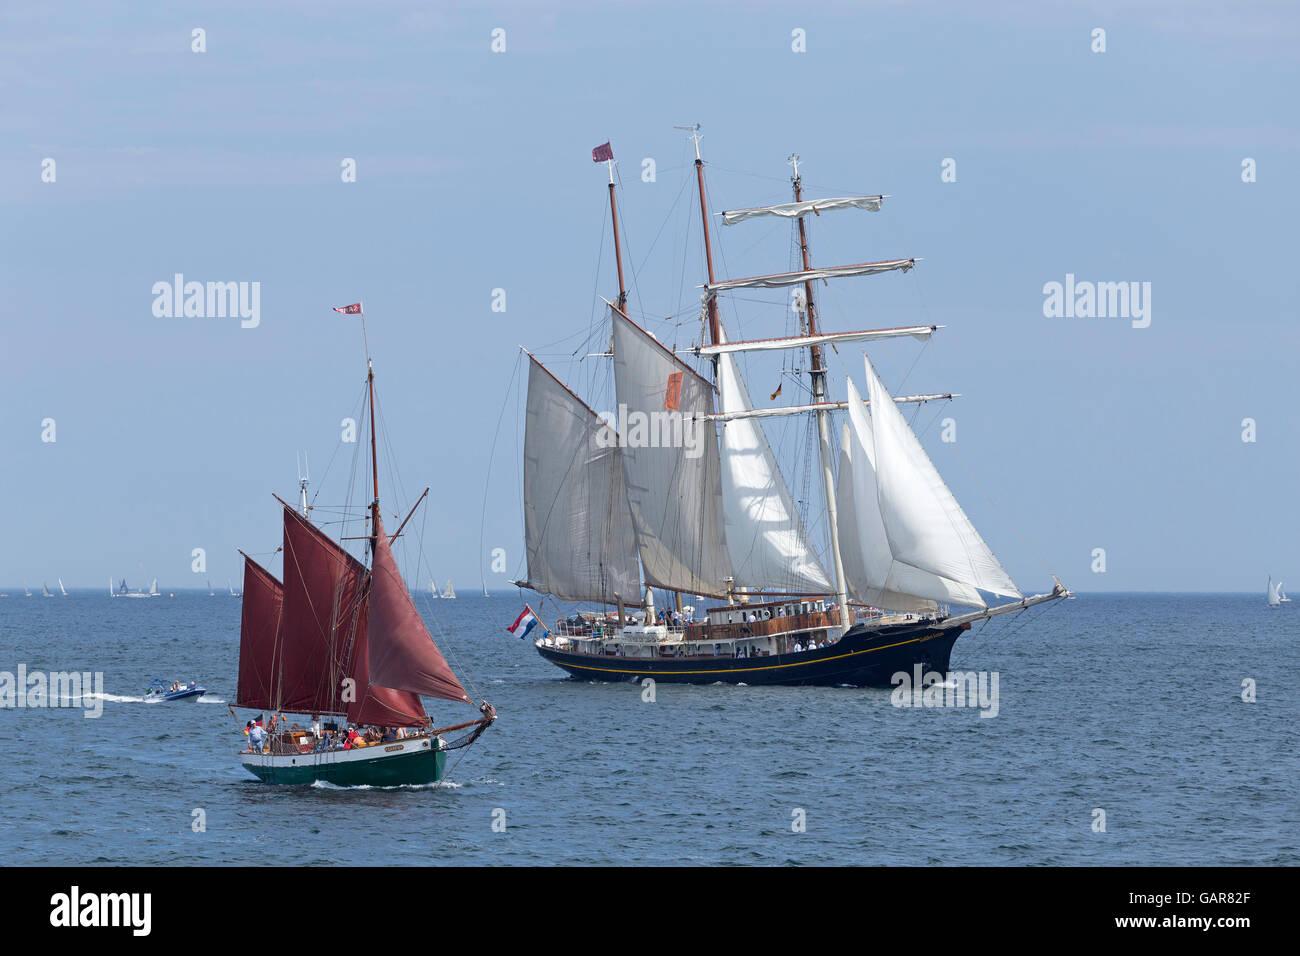 sailing ships ´Gulden Leeuw´ and ´Sampo´, Kiel Week, Kiel, Schleswig-Holstein, Germany - Stock Image